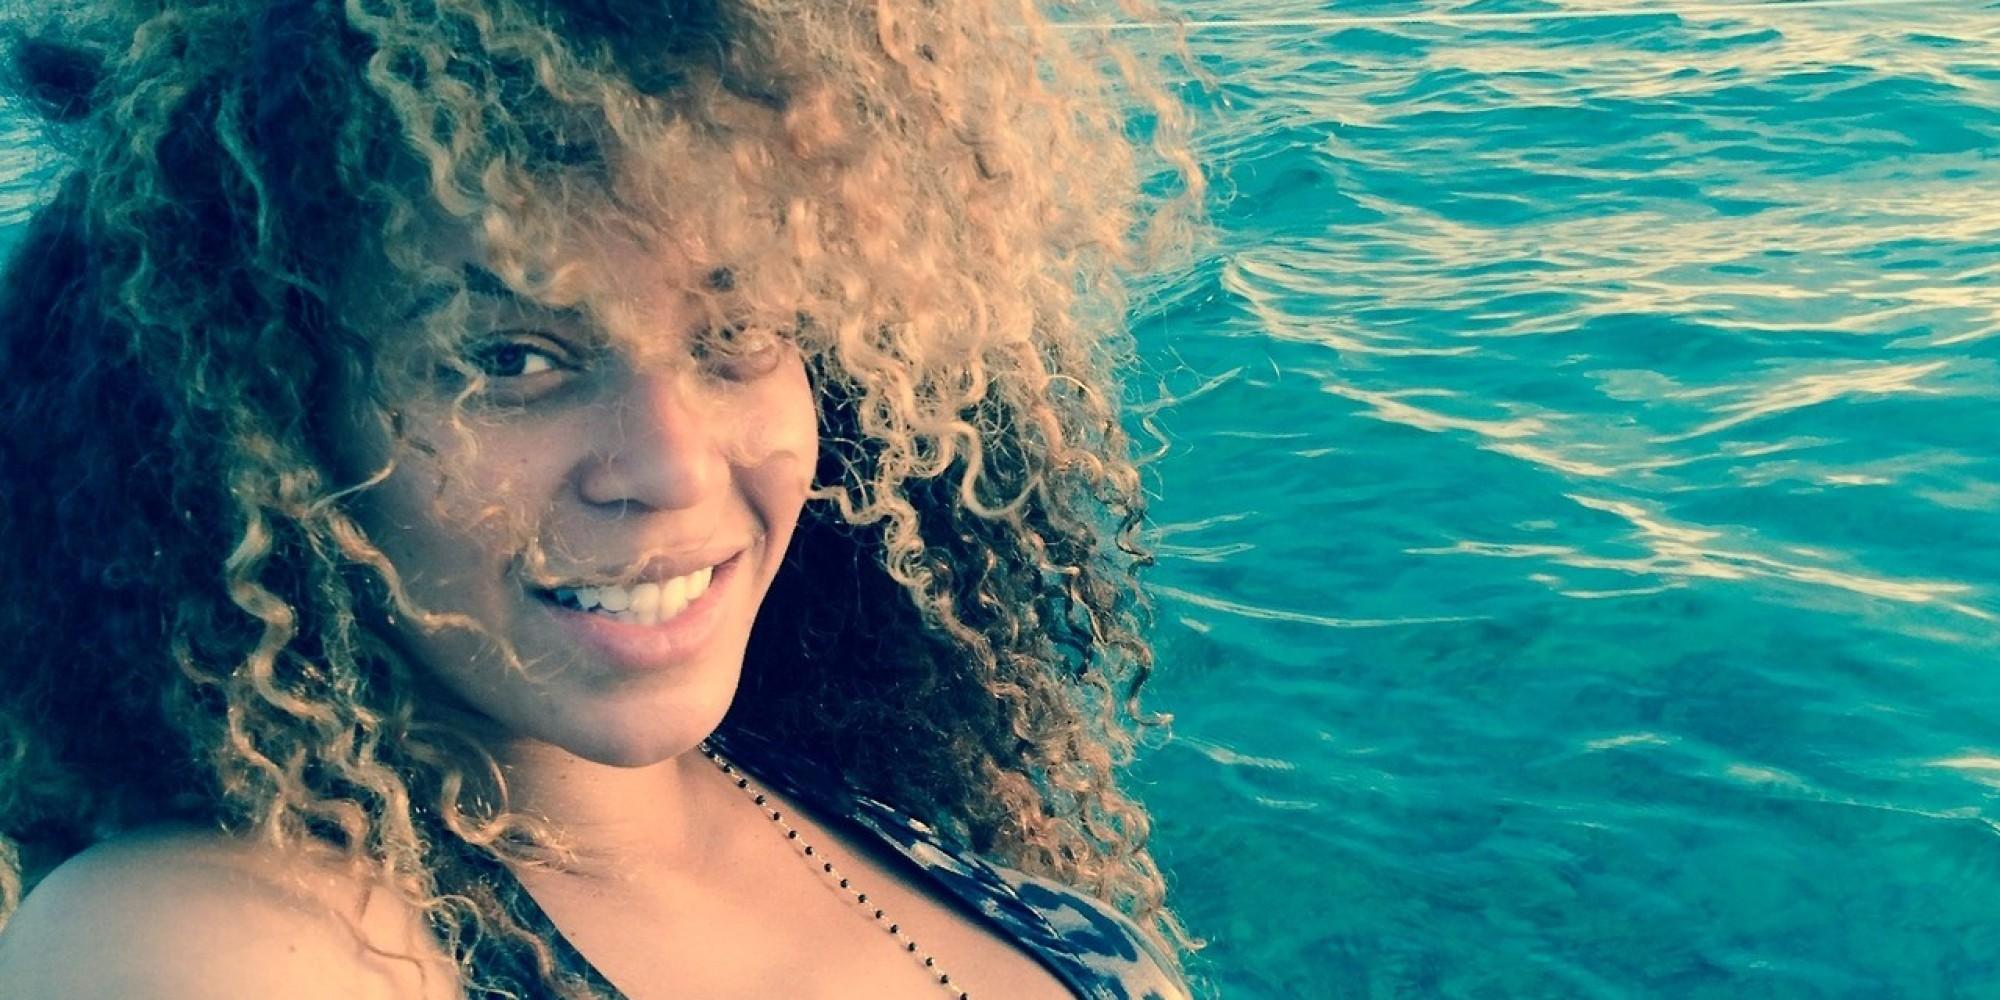 Beyonce Wears A Bikini No Makeup On Vacation With Blue